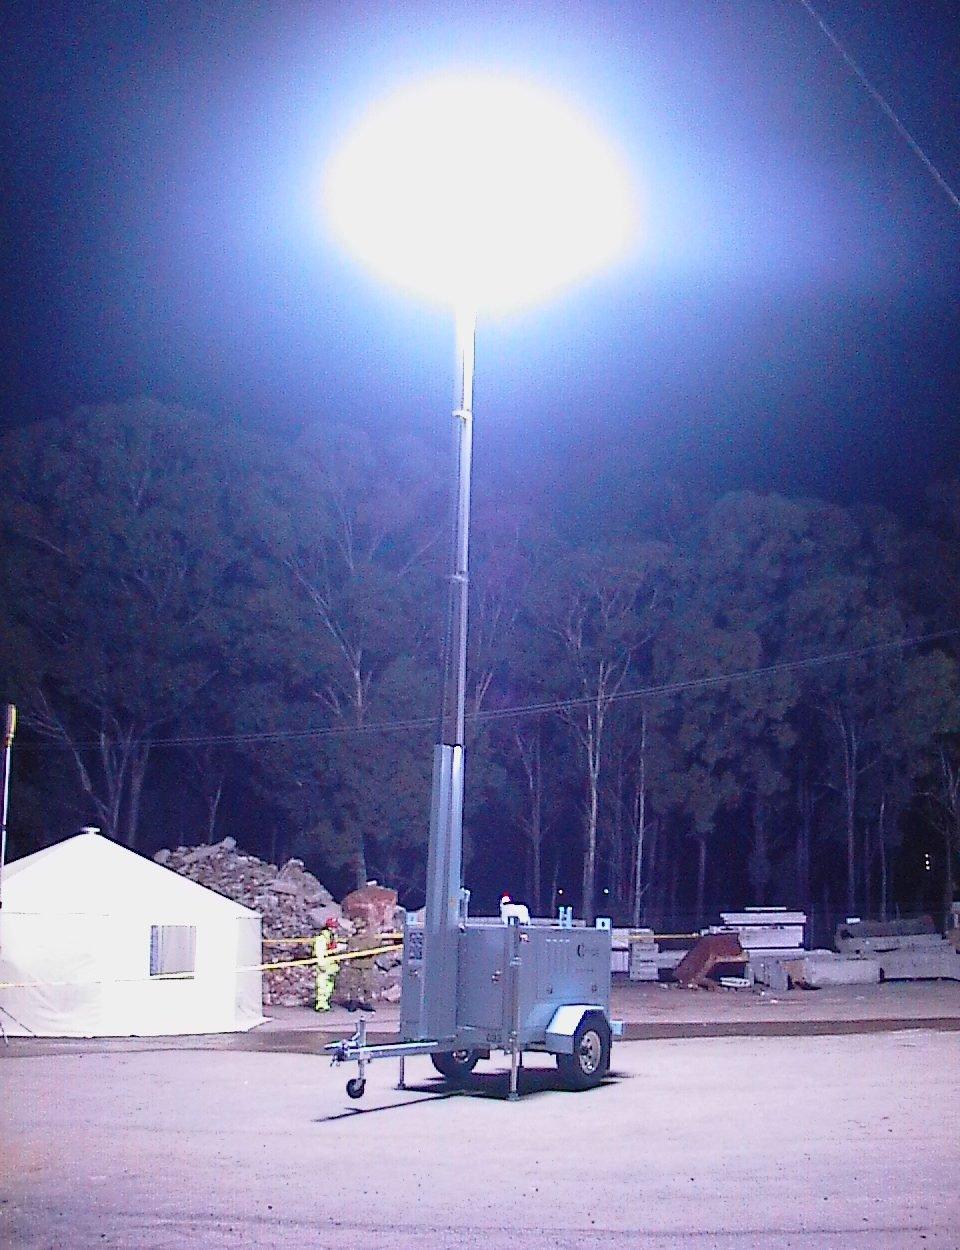 12kW HMI Lunar Lighting TowerLunar lighting